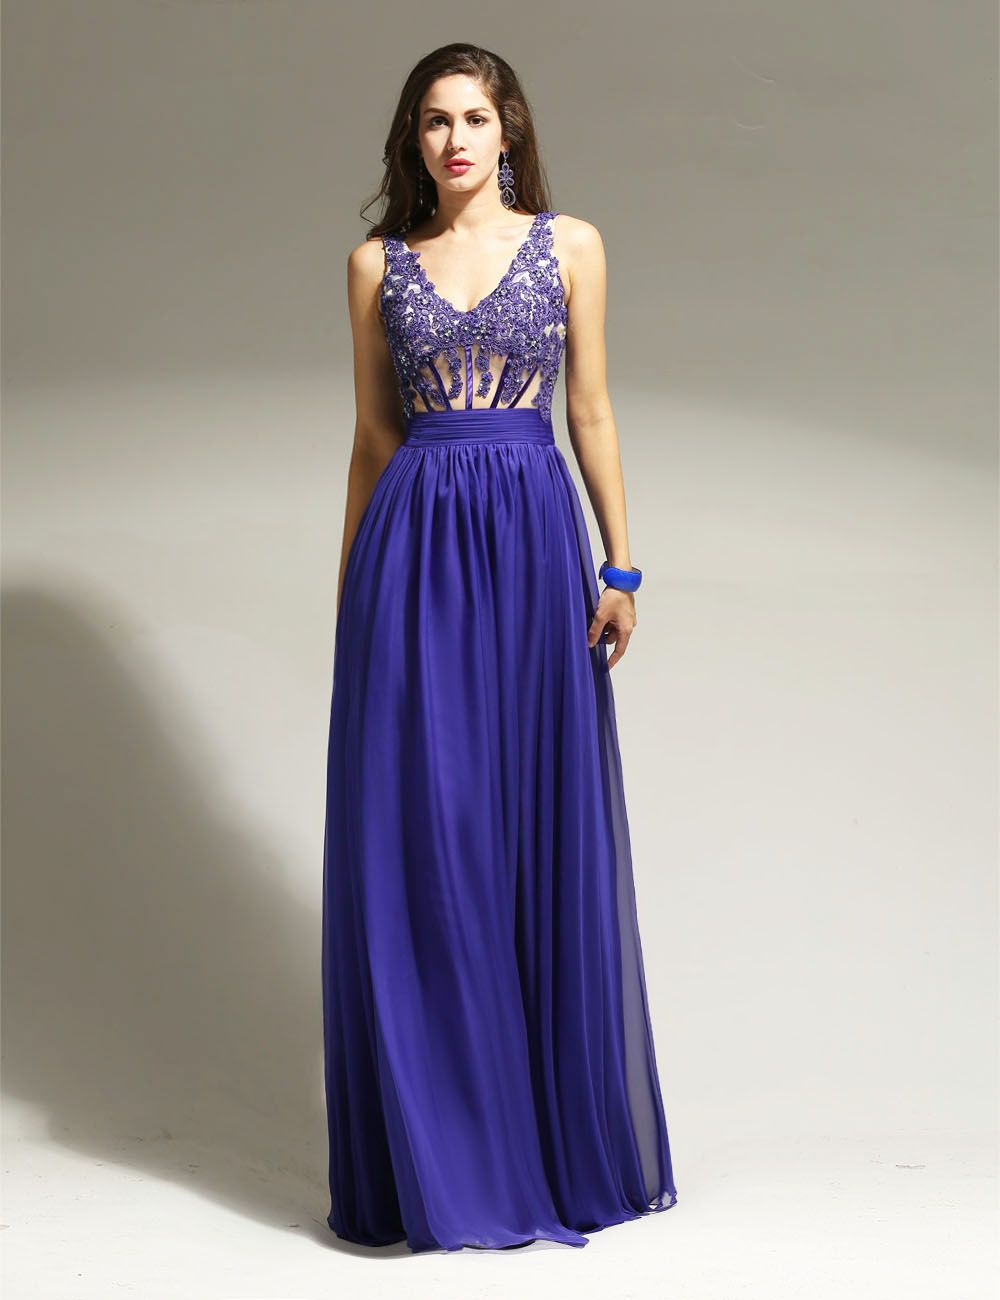 Royal blue wedding dresses plus size  Click to Buy ucuc Party Dresses Ever Pretty Chiffon Vneck Elegant